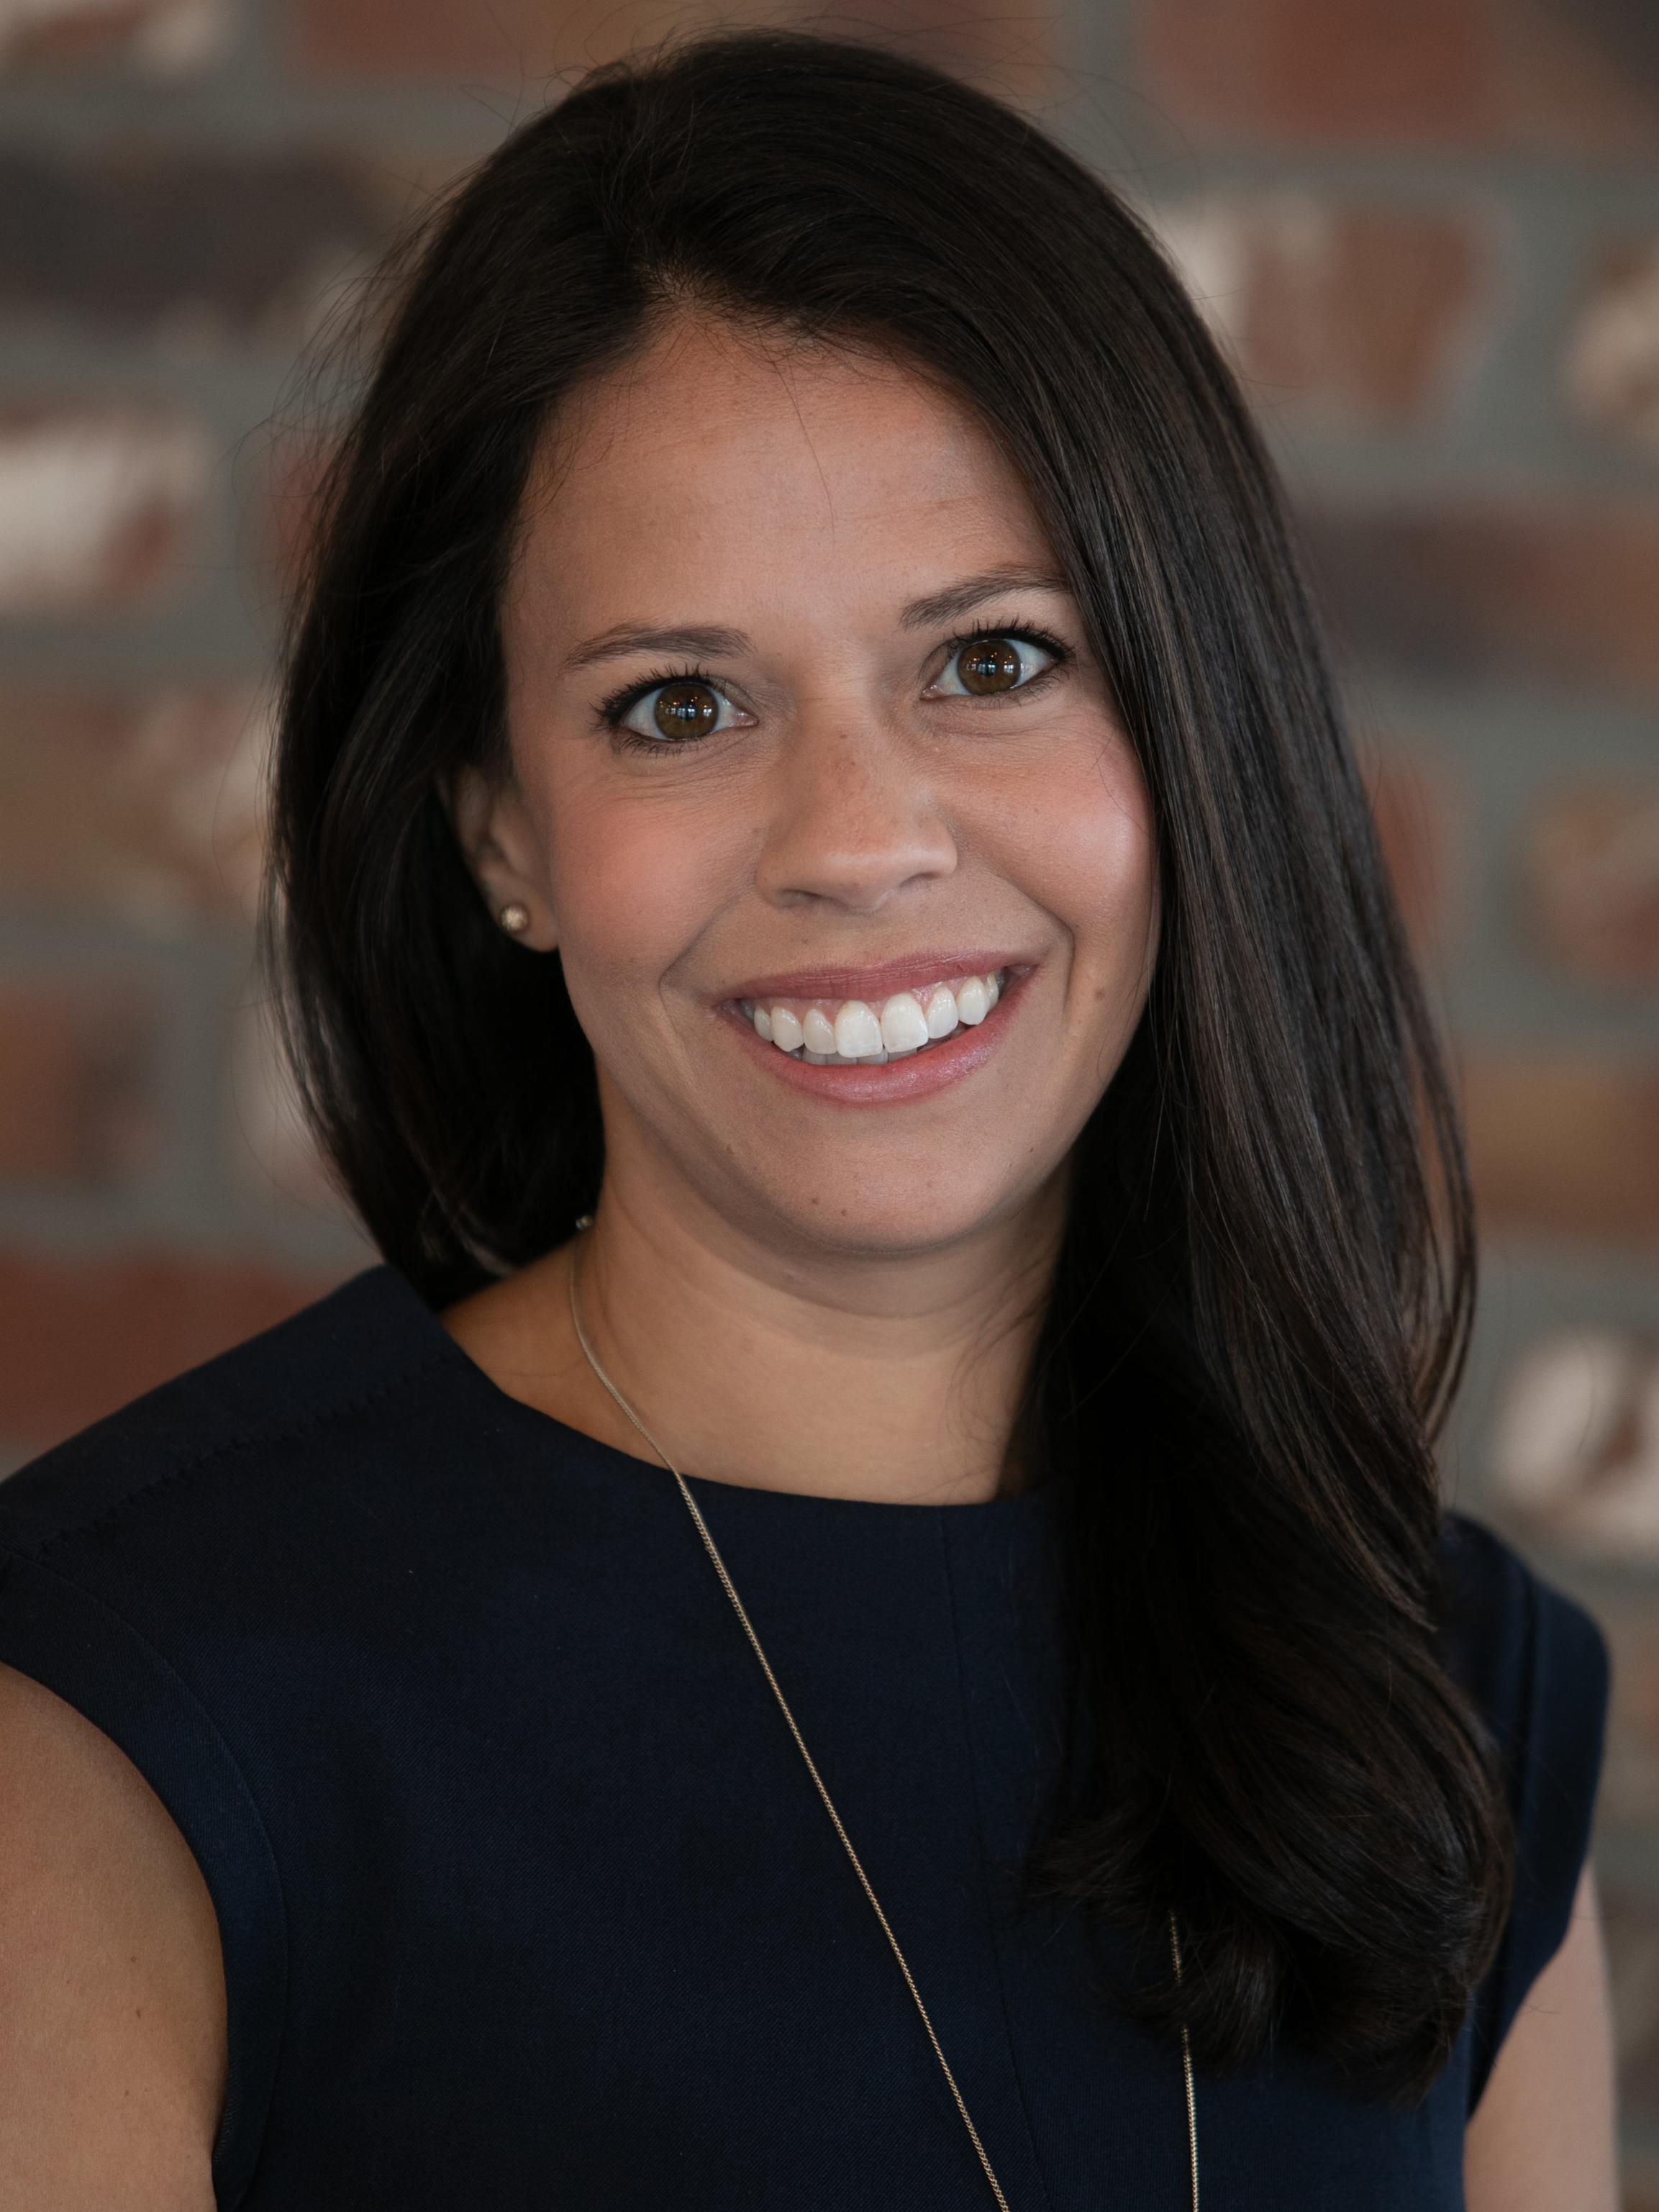 Erin Kavanaugh